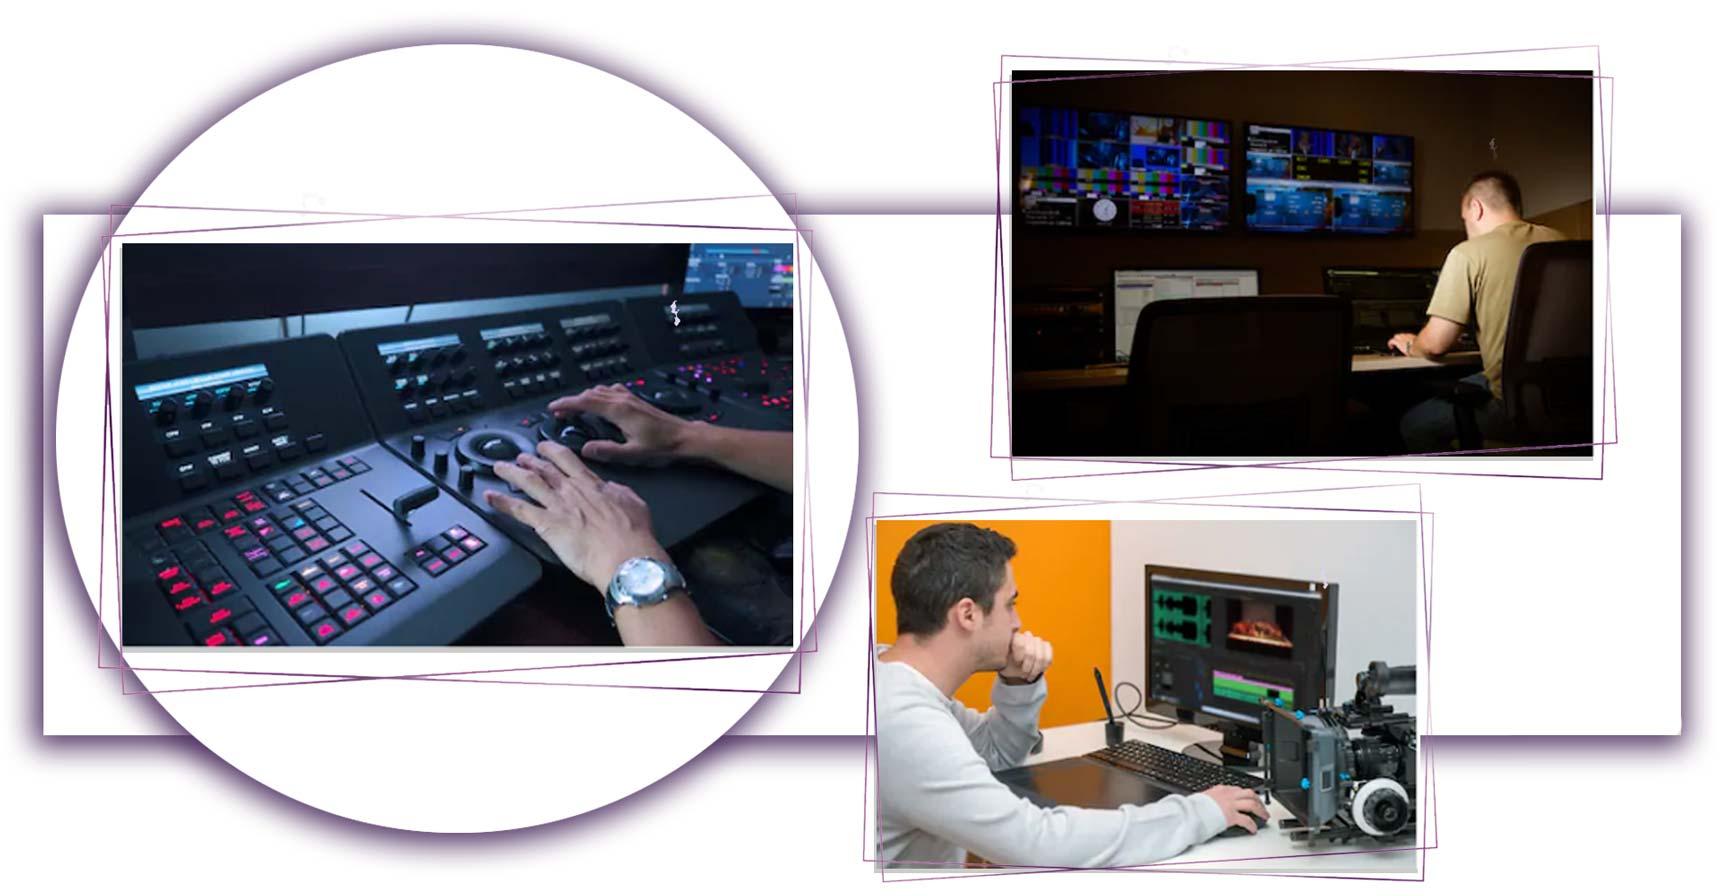 Editing 3 - کار تدوینگر چیست ؟ معرفی شغل تدوینگر